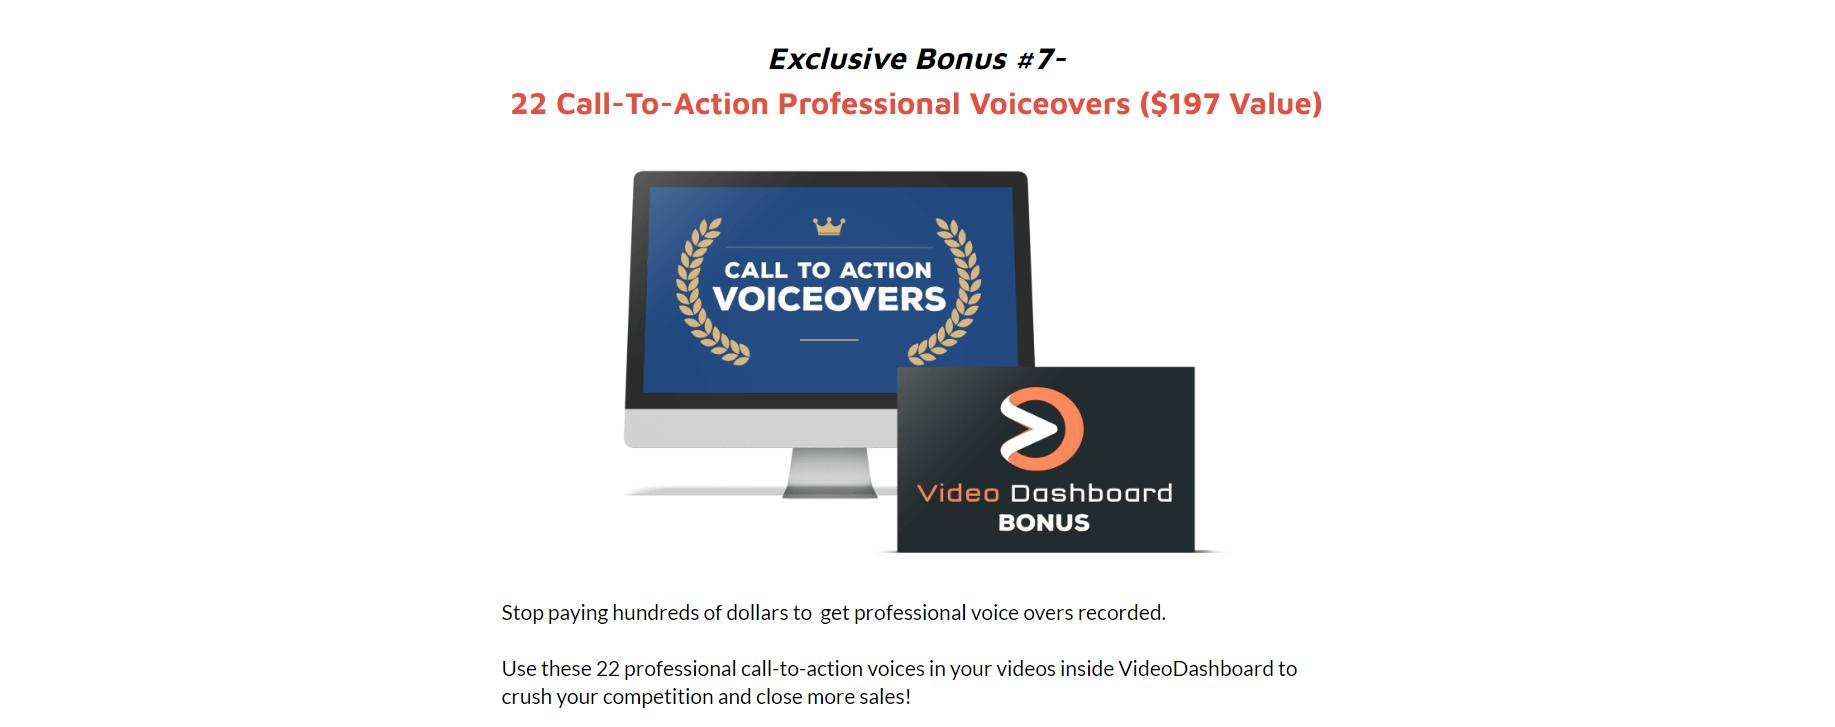 Video-Dashboard-Bonus-7